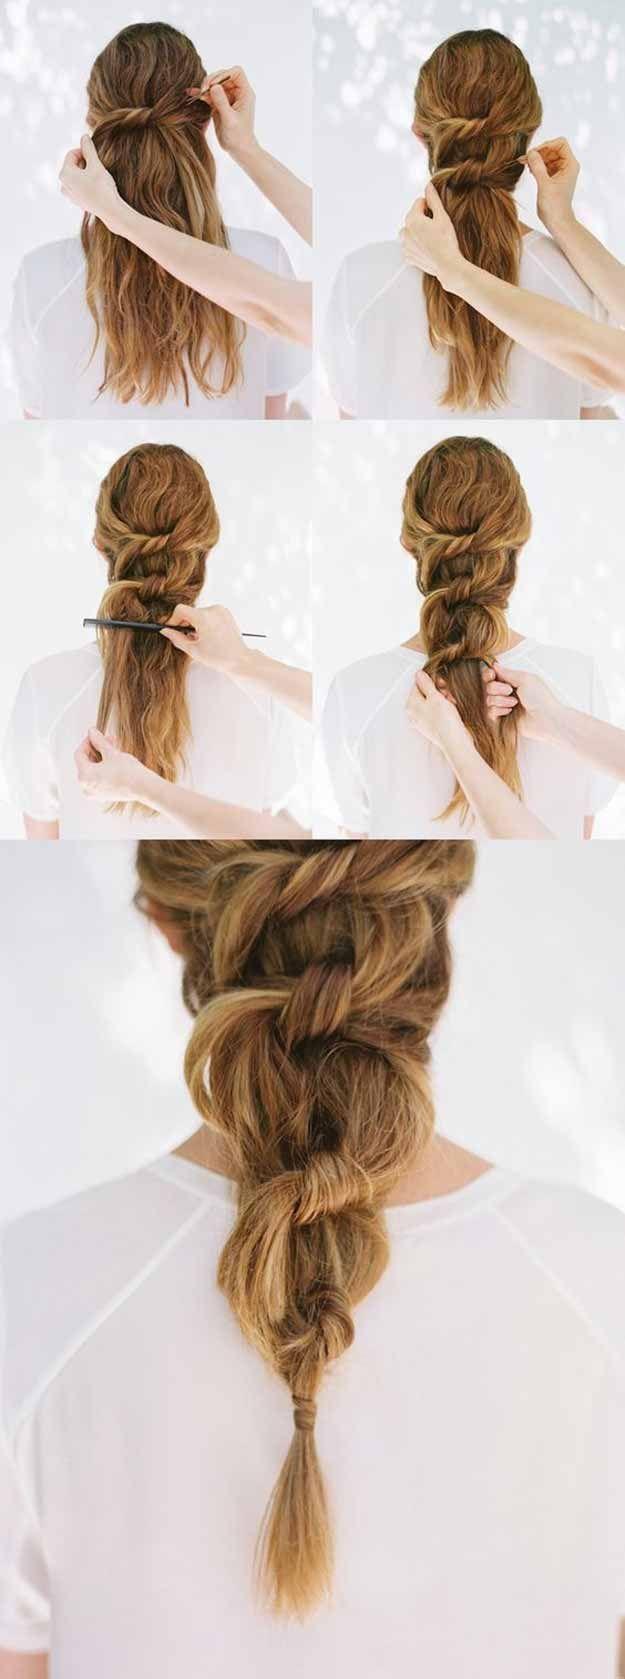 best pinterest hair tutorials knotted ponytail pinterest hair